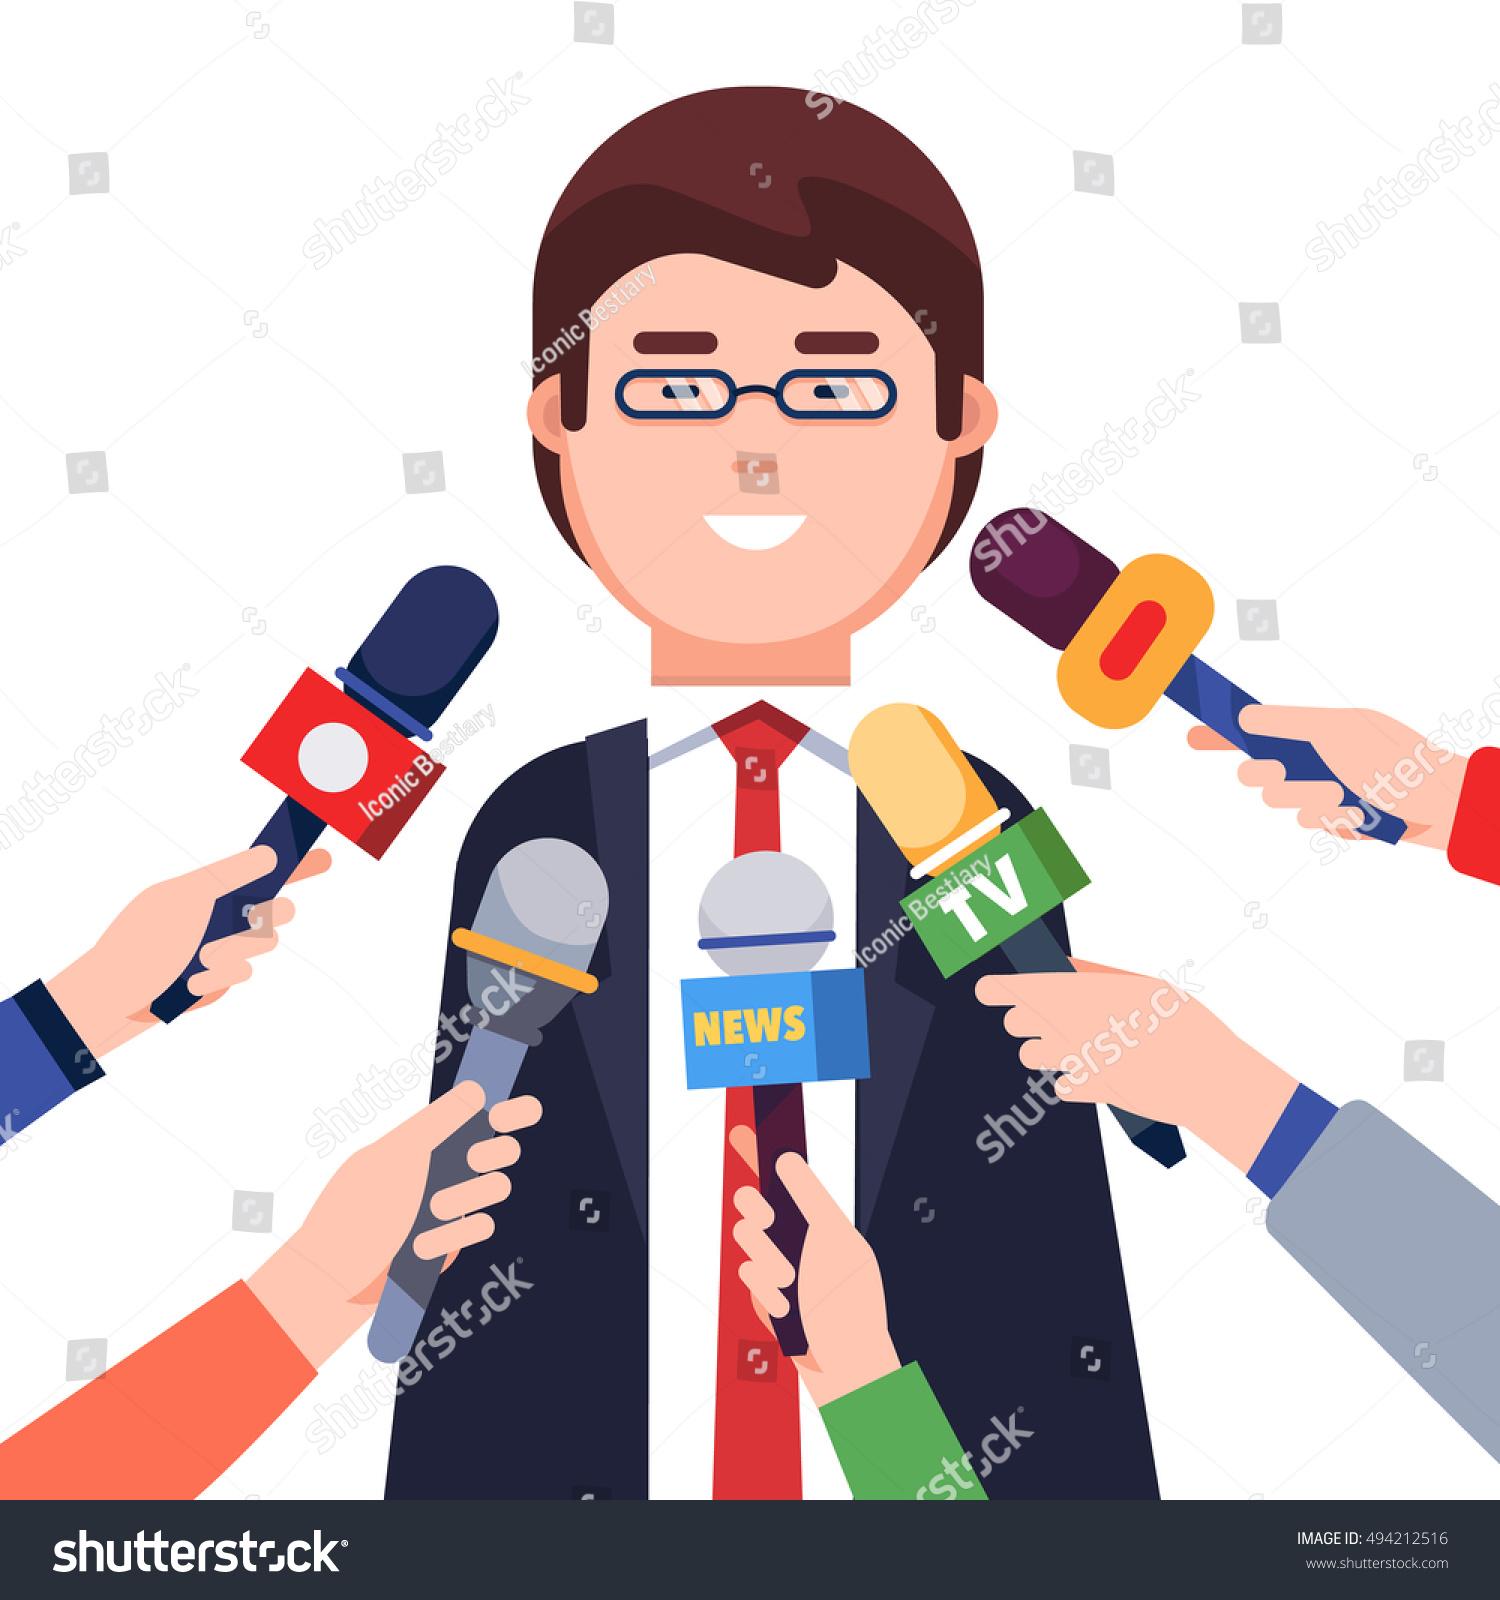 Journalist Person Stock Illustrations – 5,334 Journalist Person Stock  Illustrations, Vectors & Clipart - Dreamstime